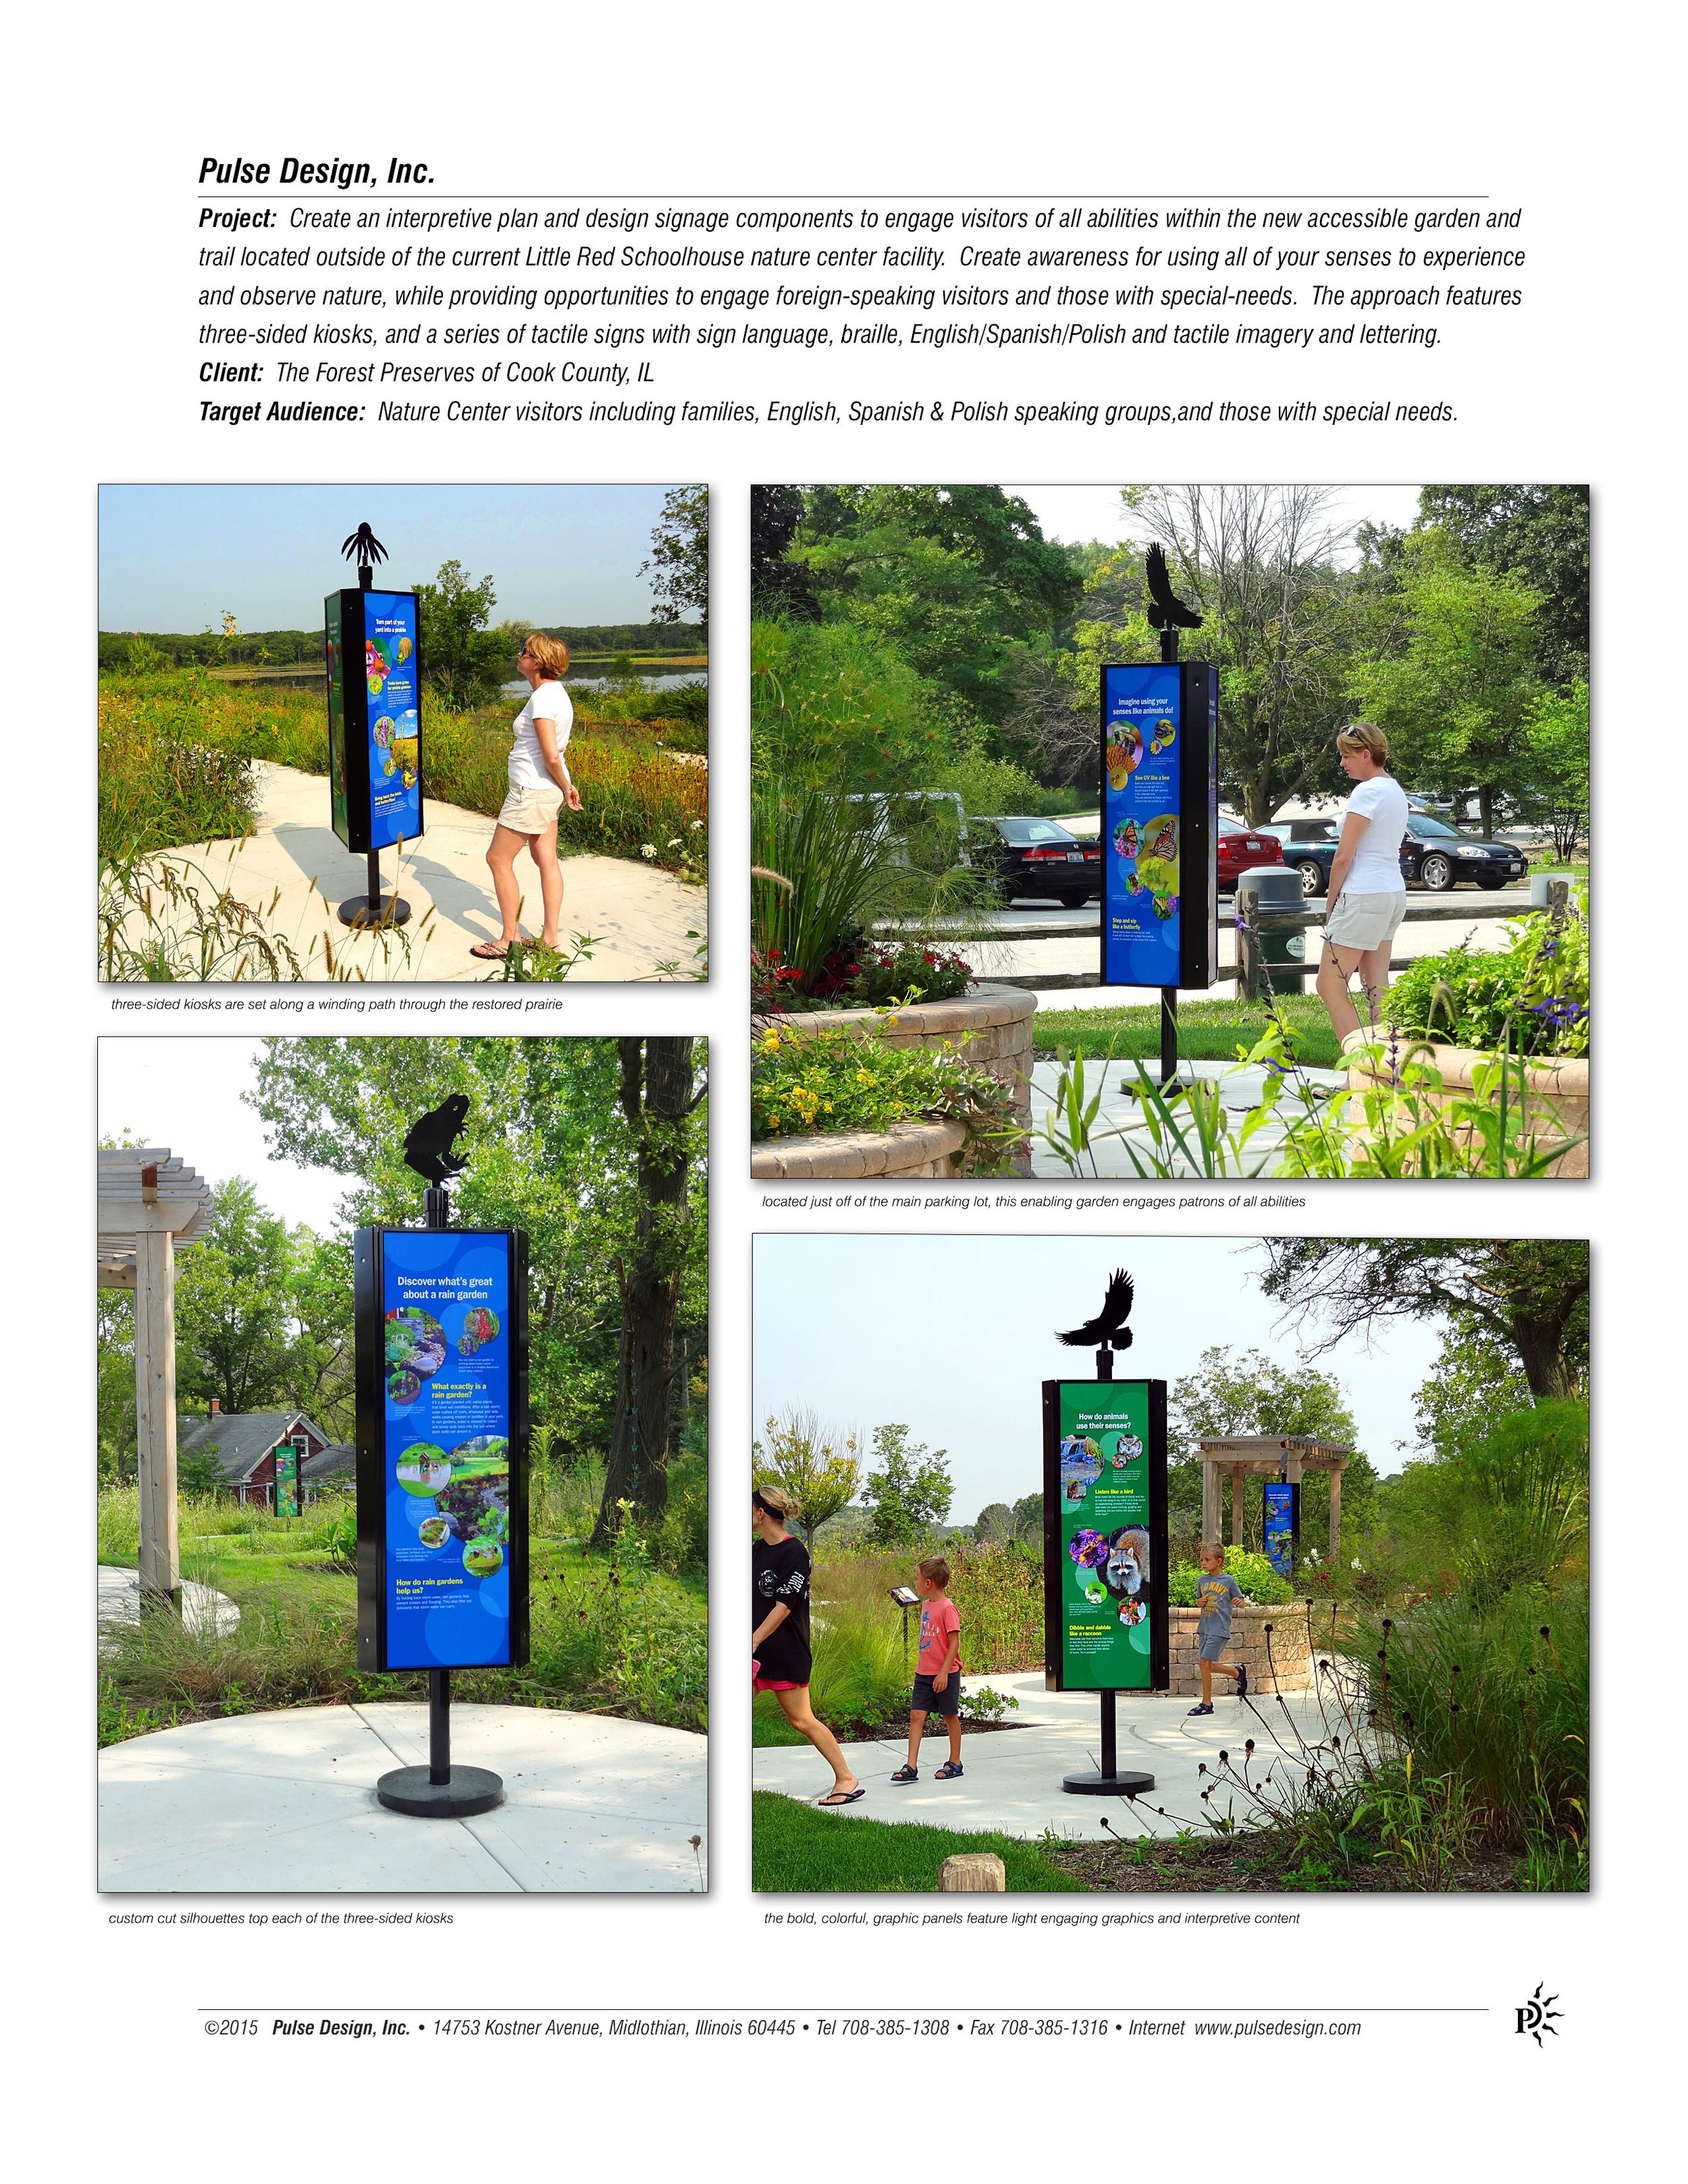 LittleRedSchoolhouse-Accessible-Garden-Trail-Sign-Photos1-Pulse-Design-Inc.jpg